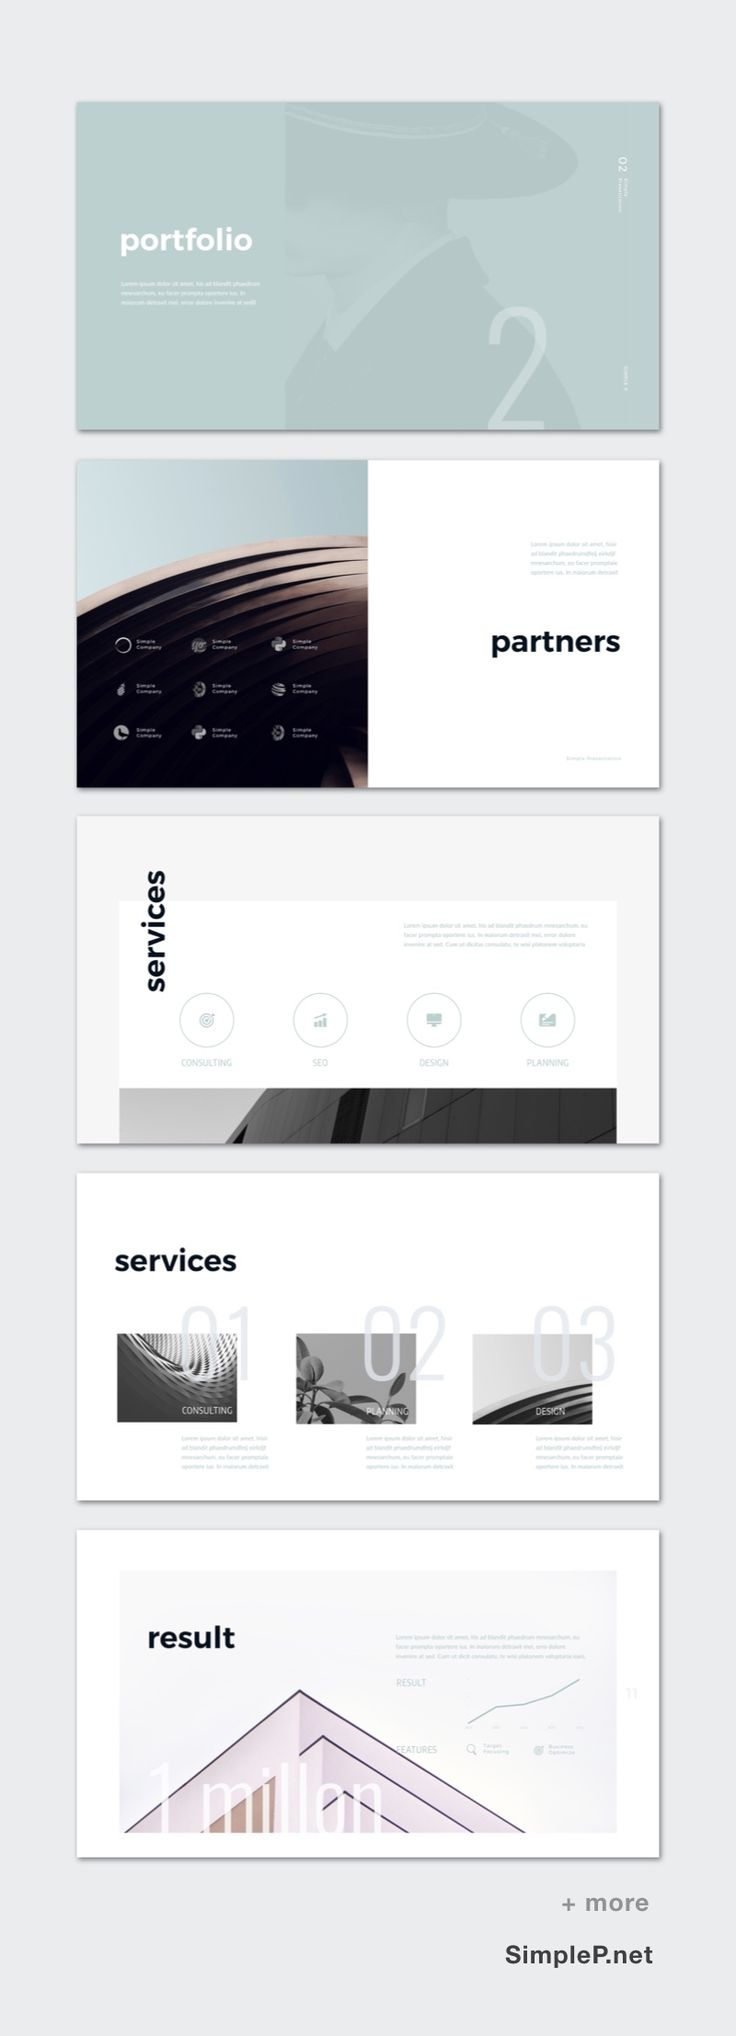 Zero Presentation Keynote Template #partners #services #flow #process #result #presentation #template #keynote #business #company #corporate #introduce #portfolio